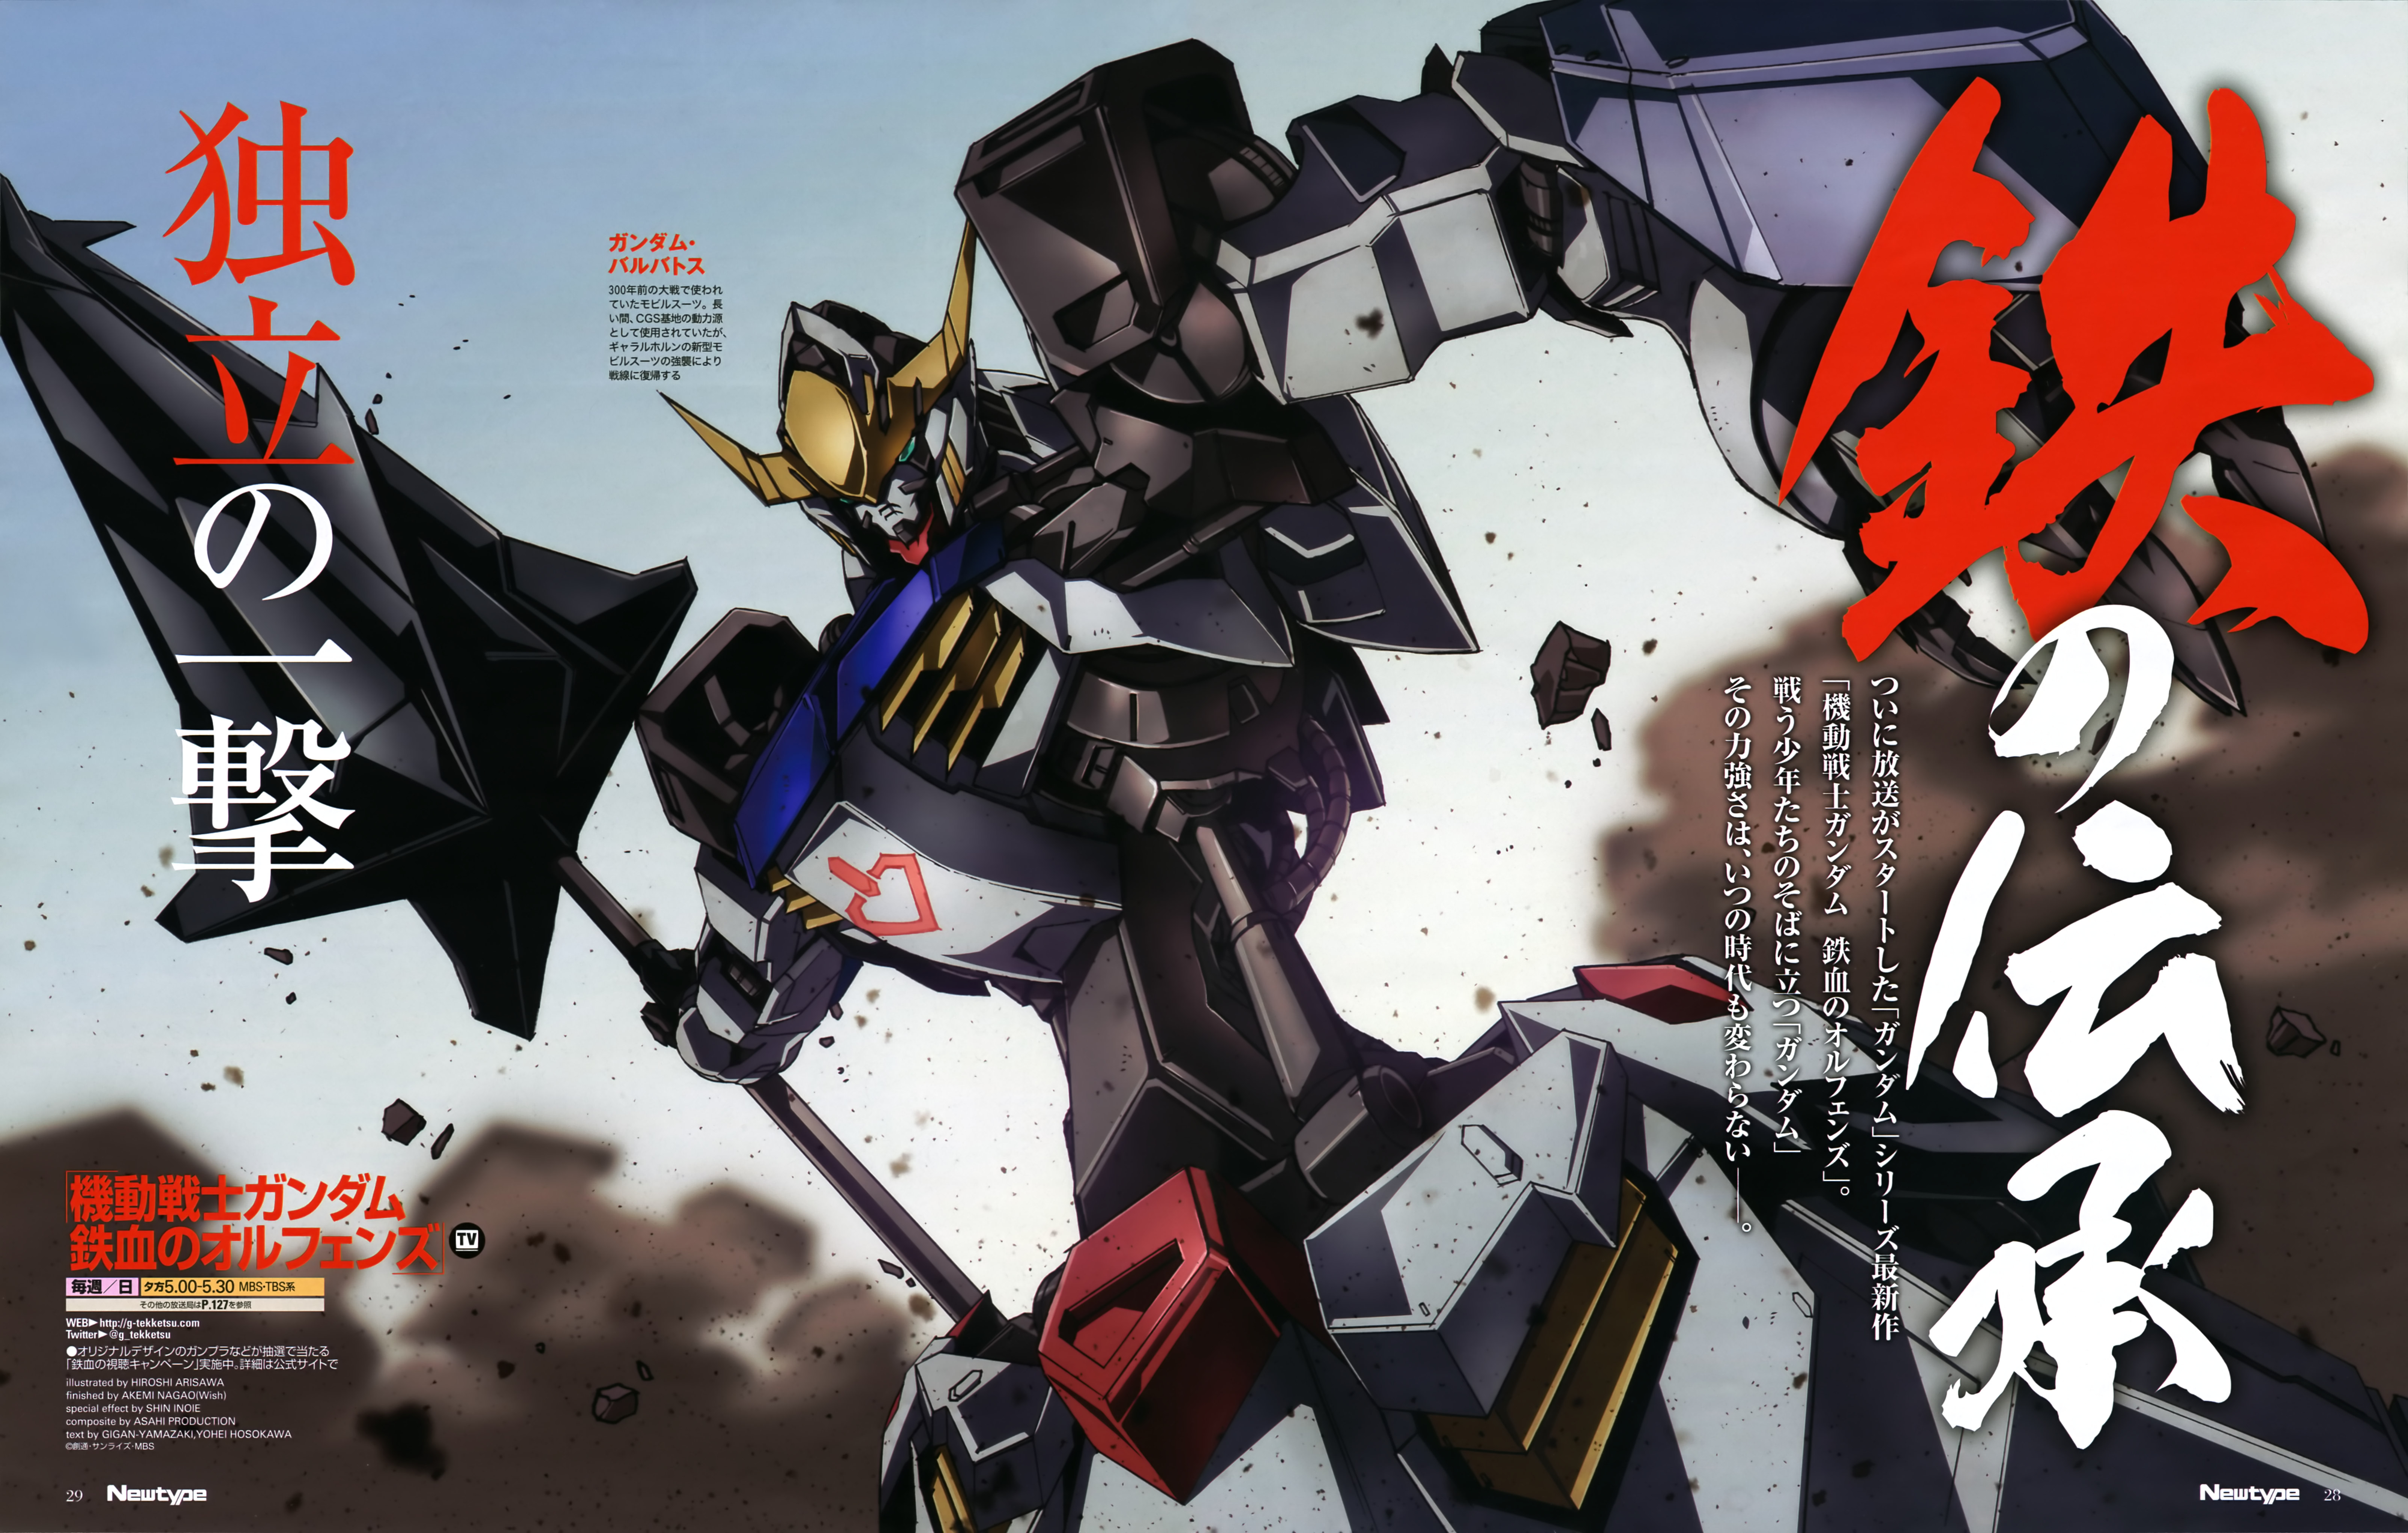 Asw G 08 Gundam Barbatos Mecha Zerochan Anime Image Board